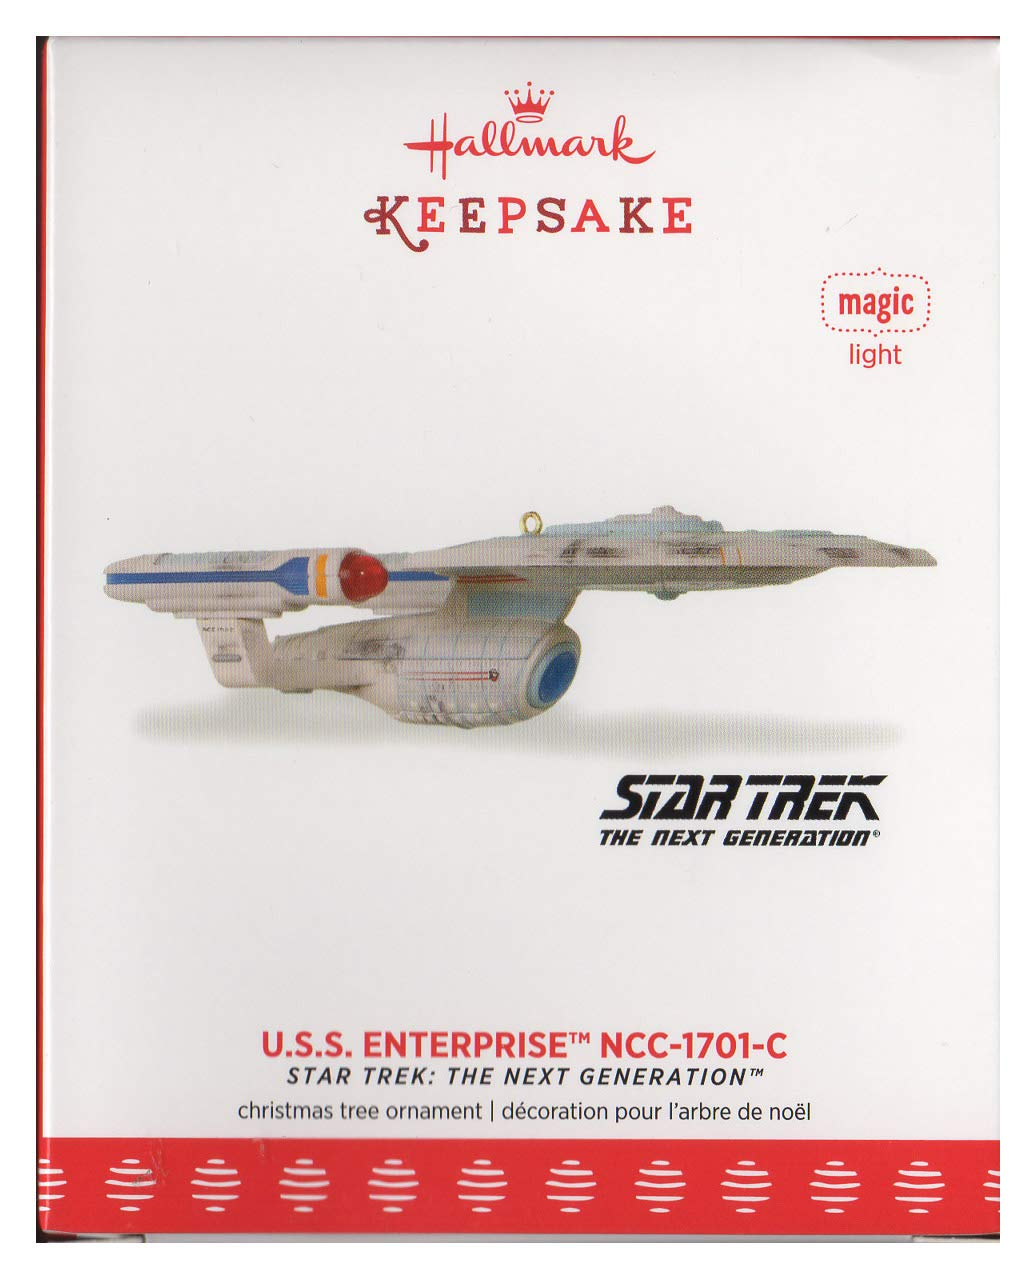 Amazon.com: SDCC NYCC 2017 U.S.S. Enterprise NCC-1701-C Star Trek: The next  Generation Hallmark Ornament: Home & Kitchen